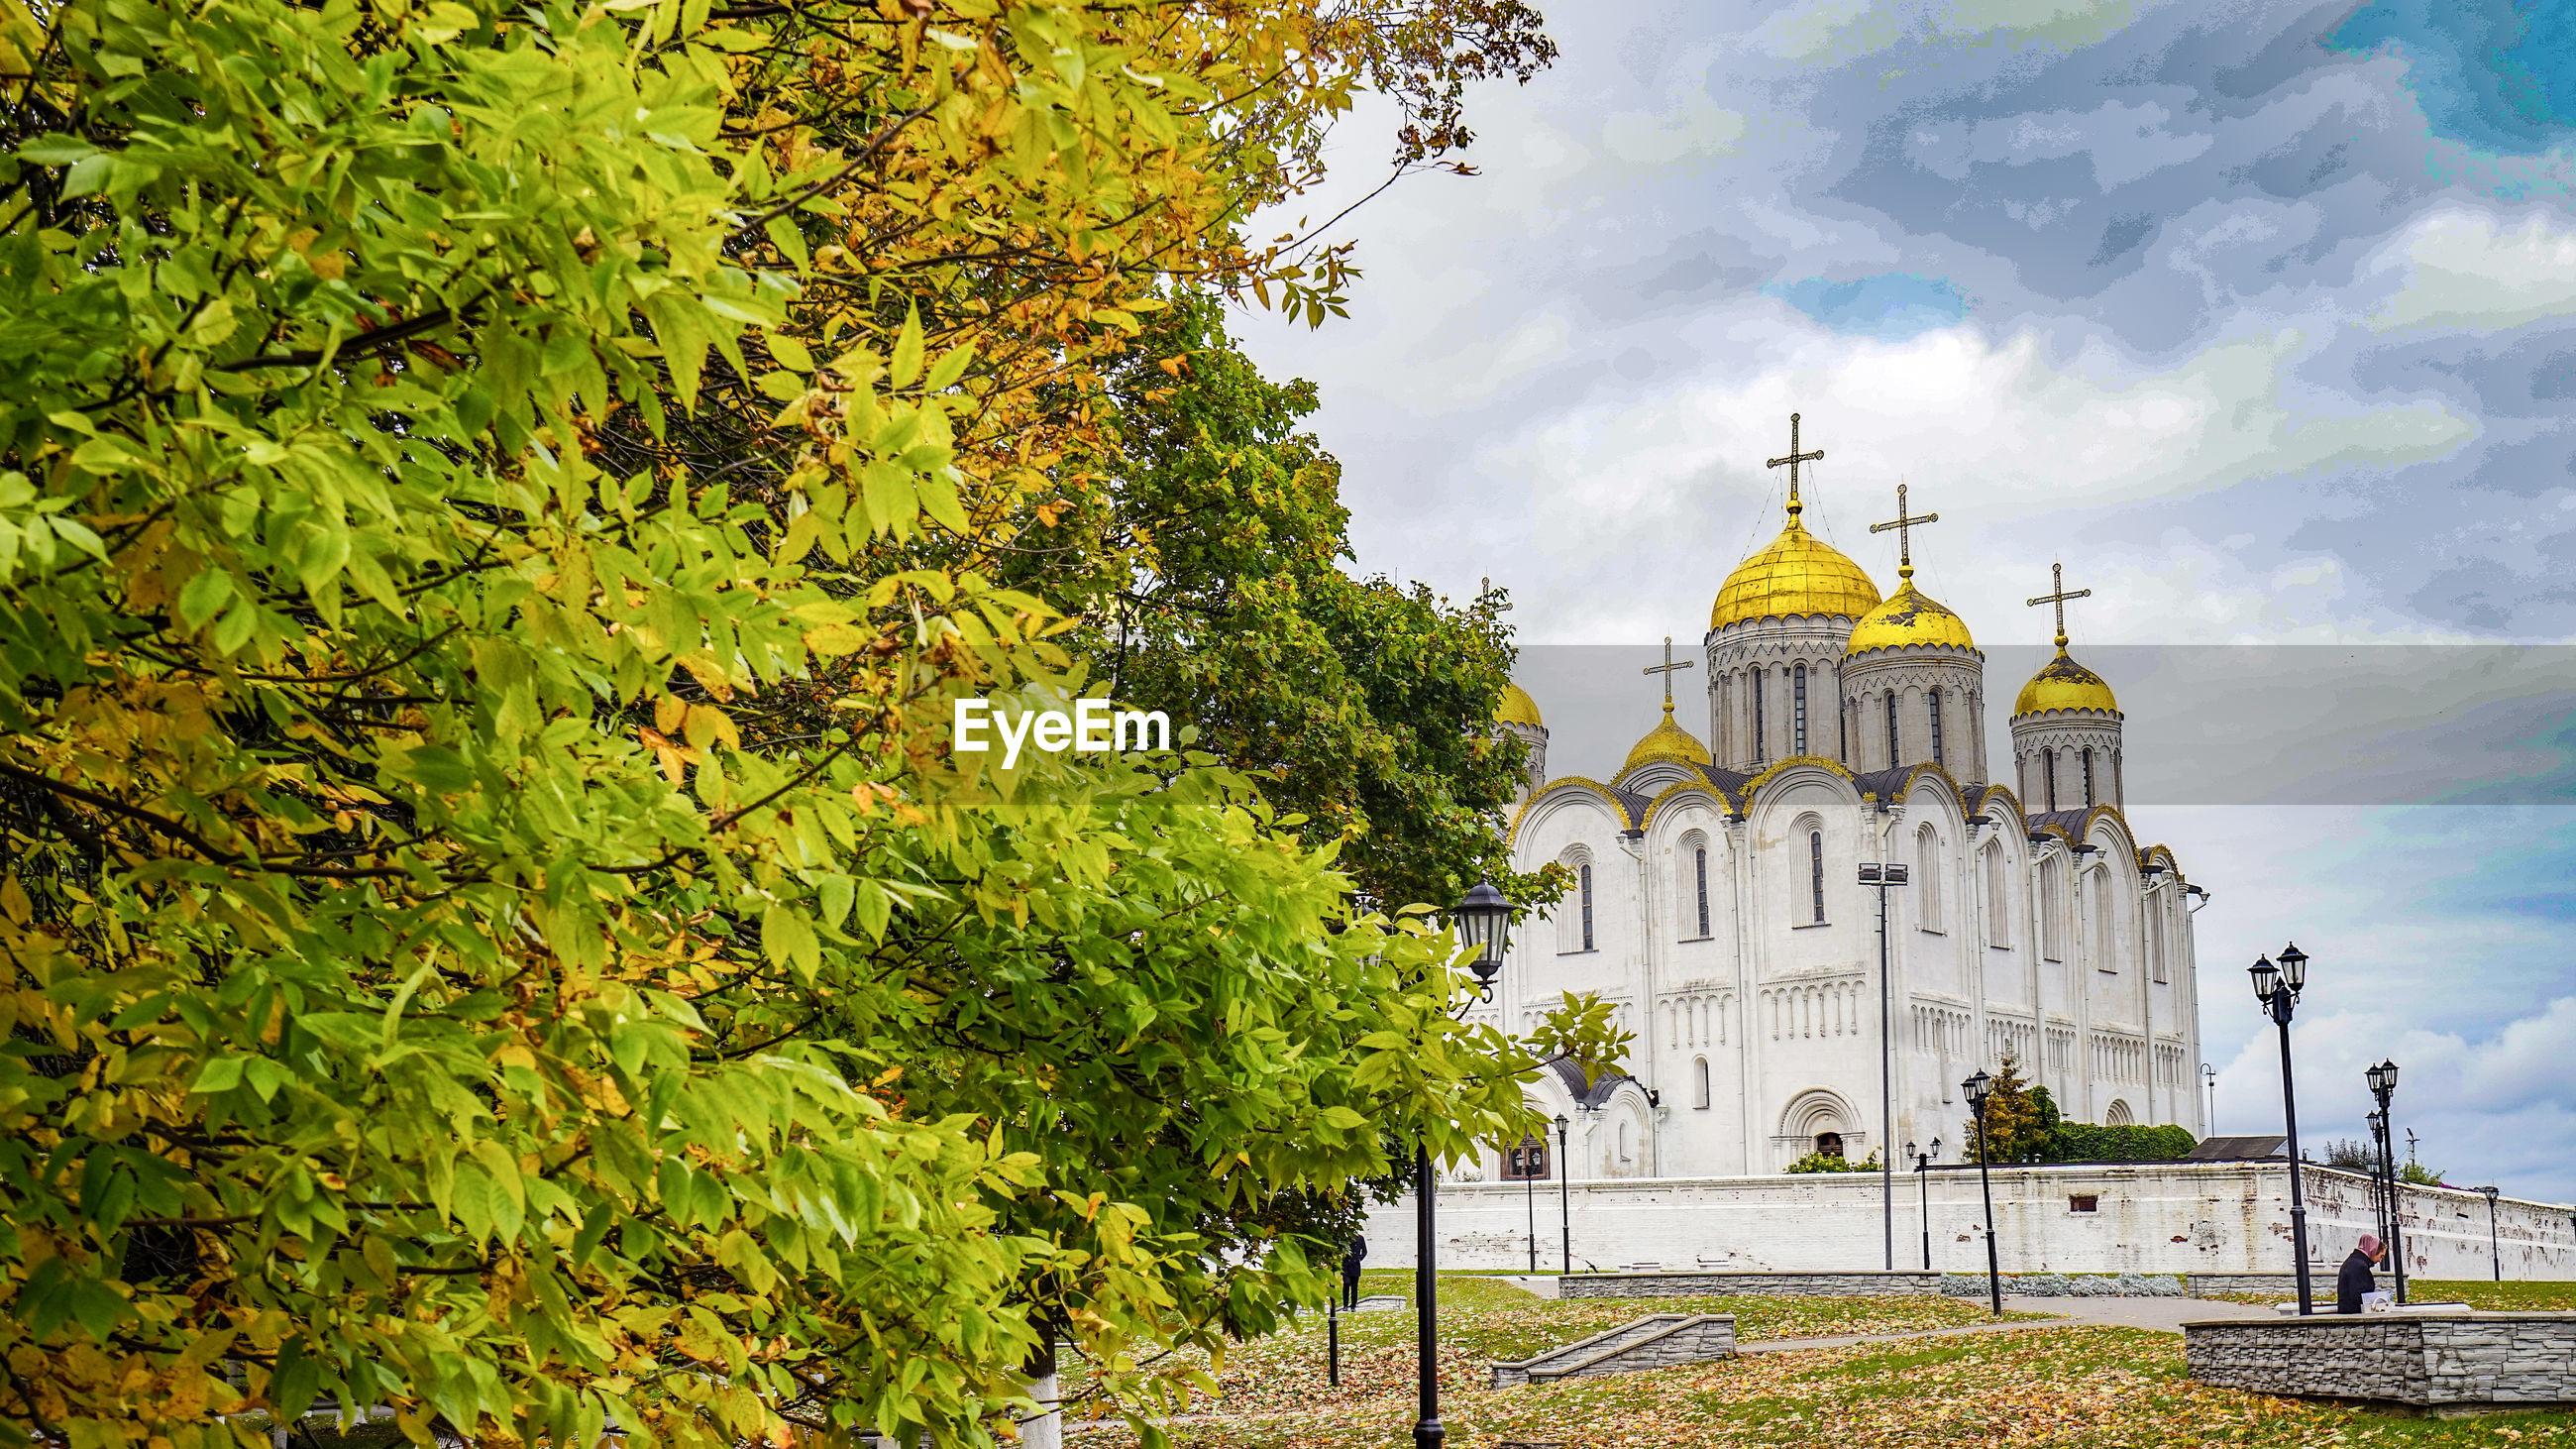 Elegant church in the golden season